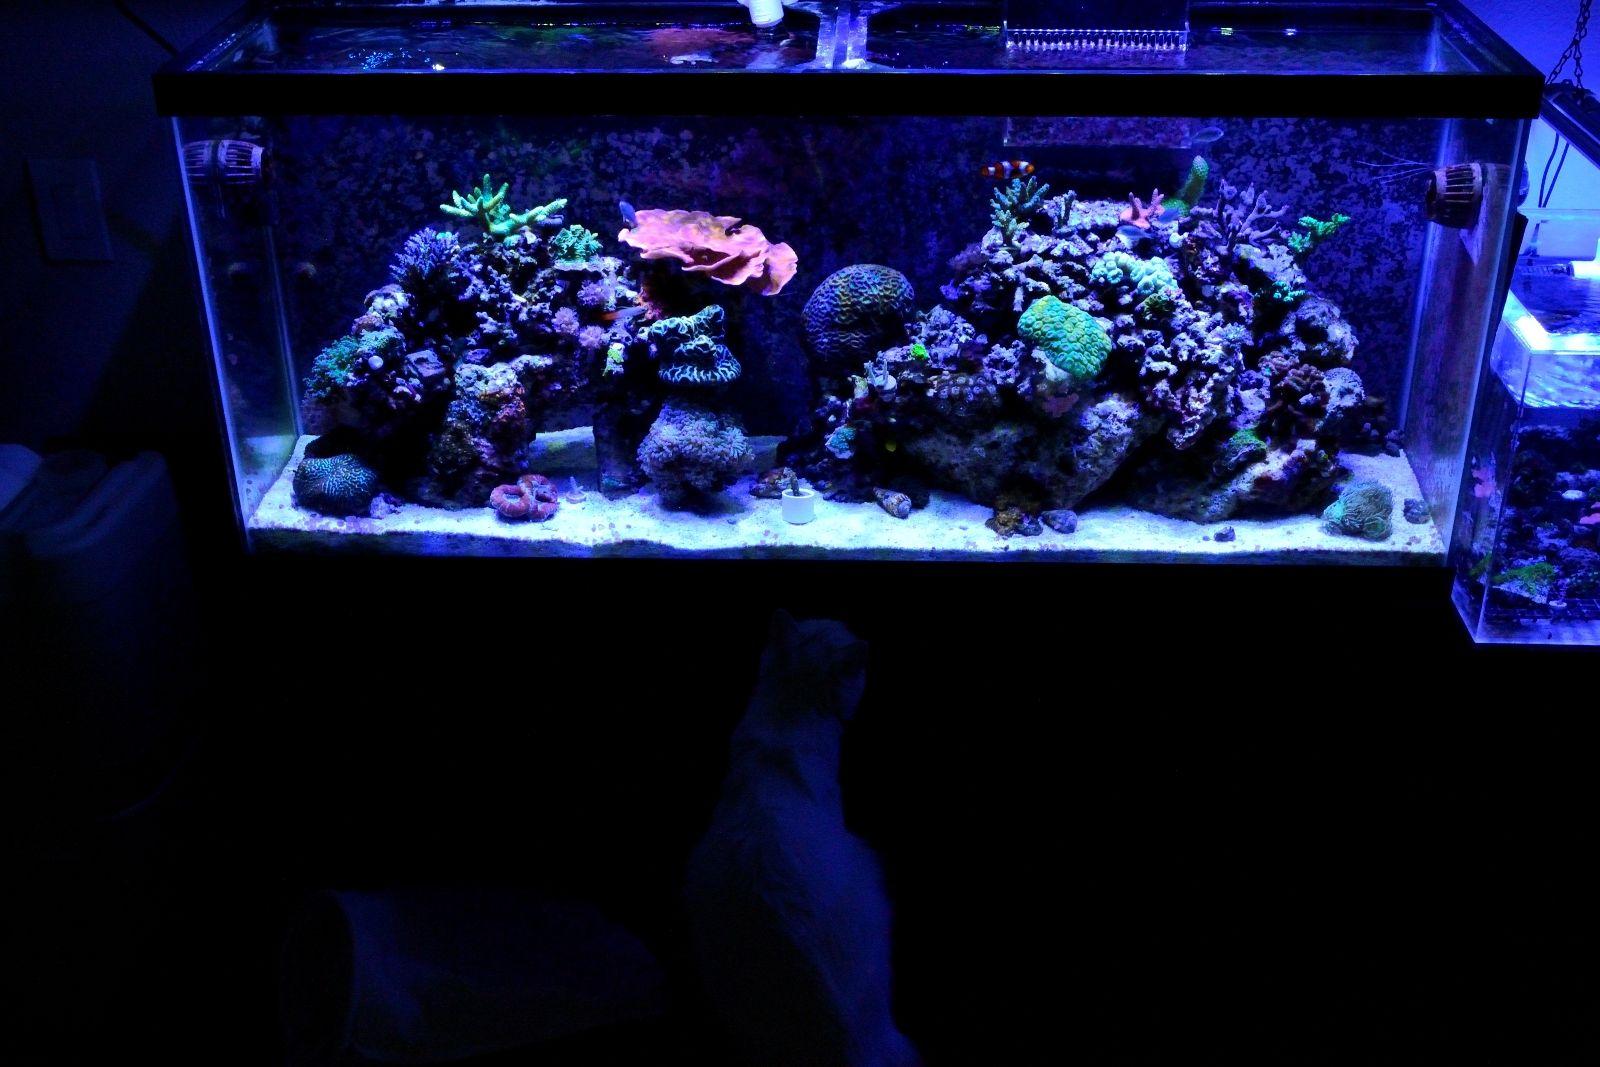 Need 55 Gallon Reef Setup Feedback And Help 55 Gallon Saltwater Tank Saltwater Aquarium